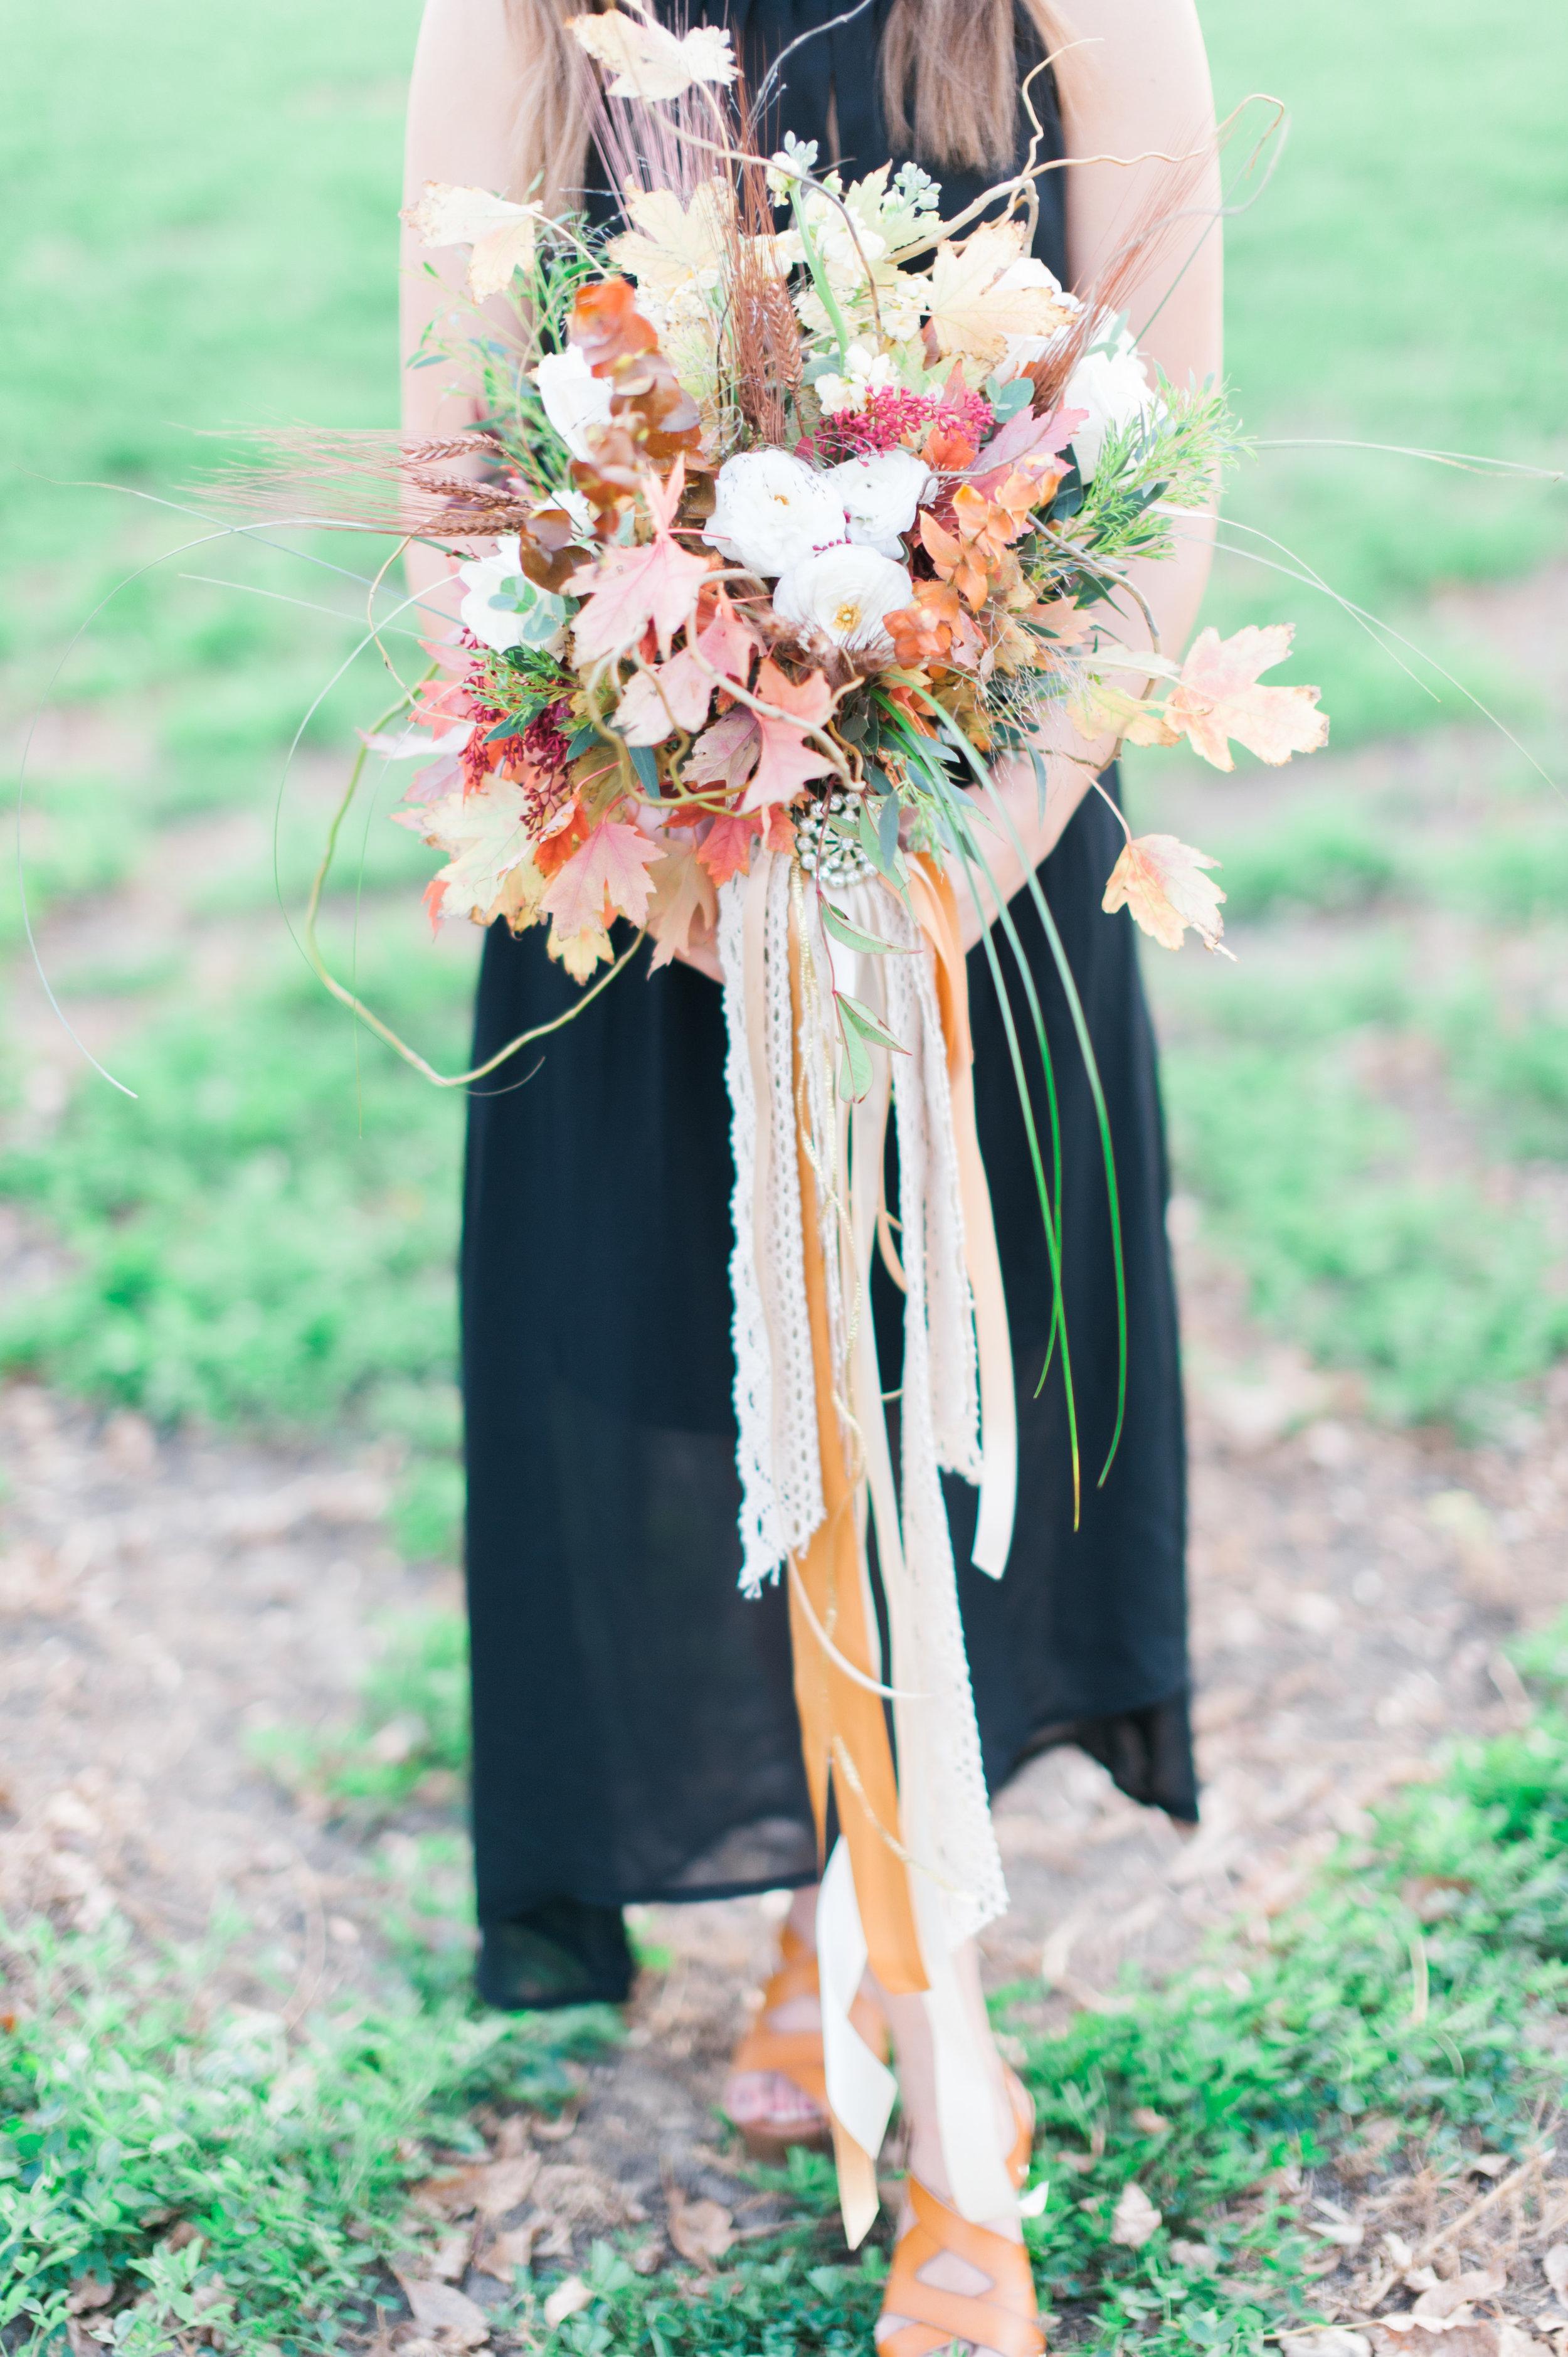 omaha-engagements-outdoor-fall-florists-17.jpg